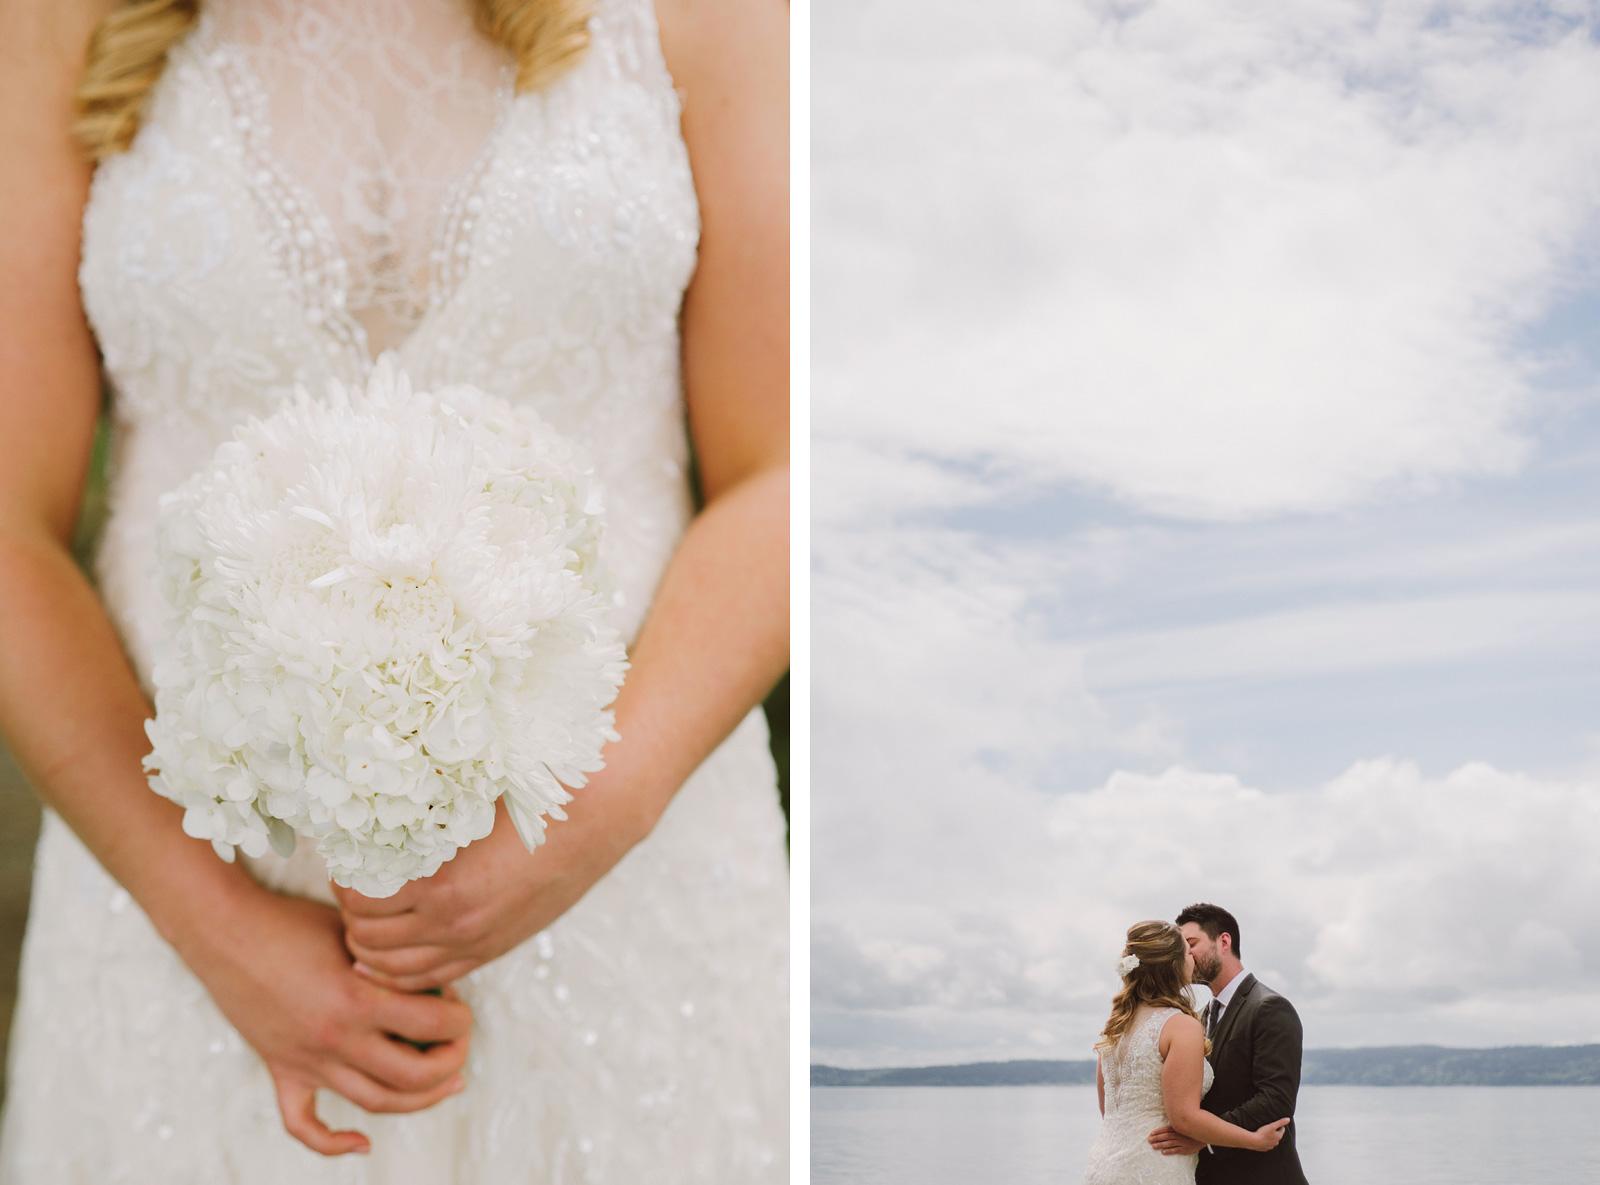 Portraits of bride and groom at Cama Beach State Park | Camano Island Wedding